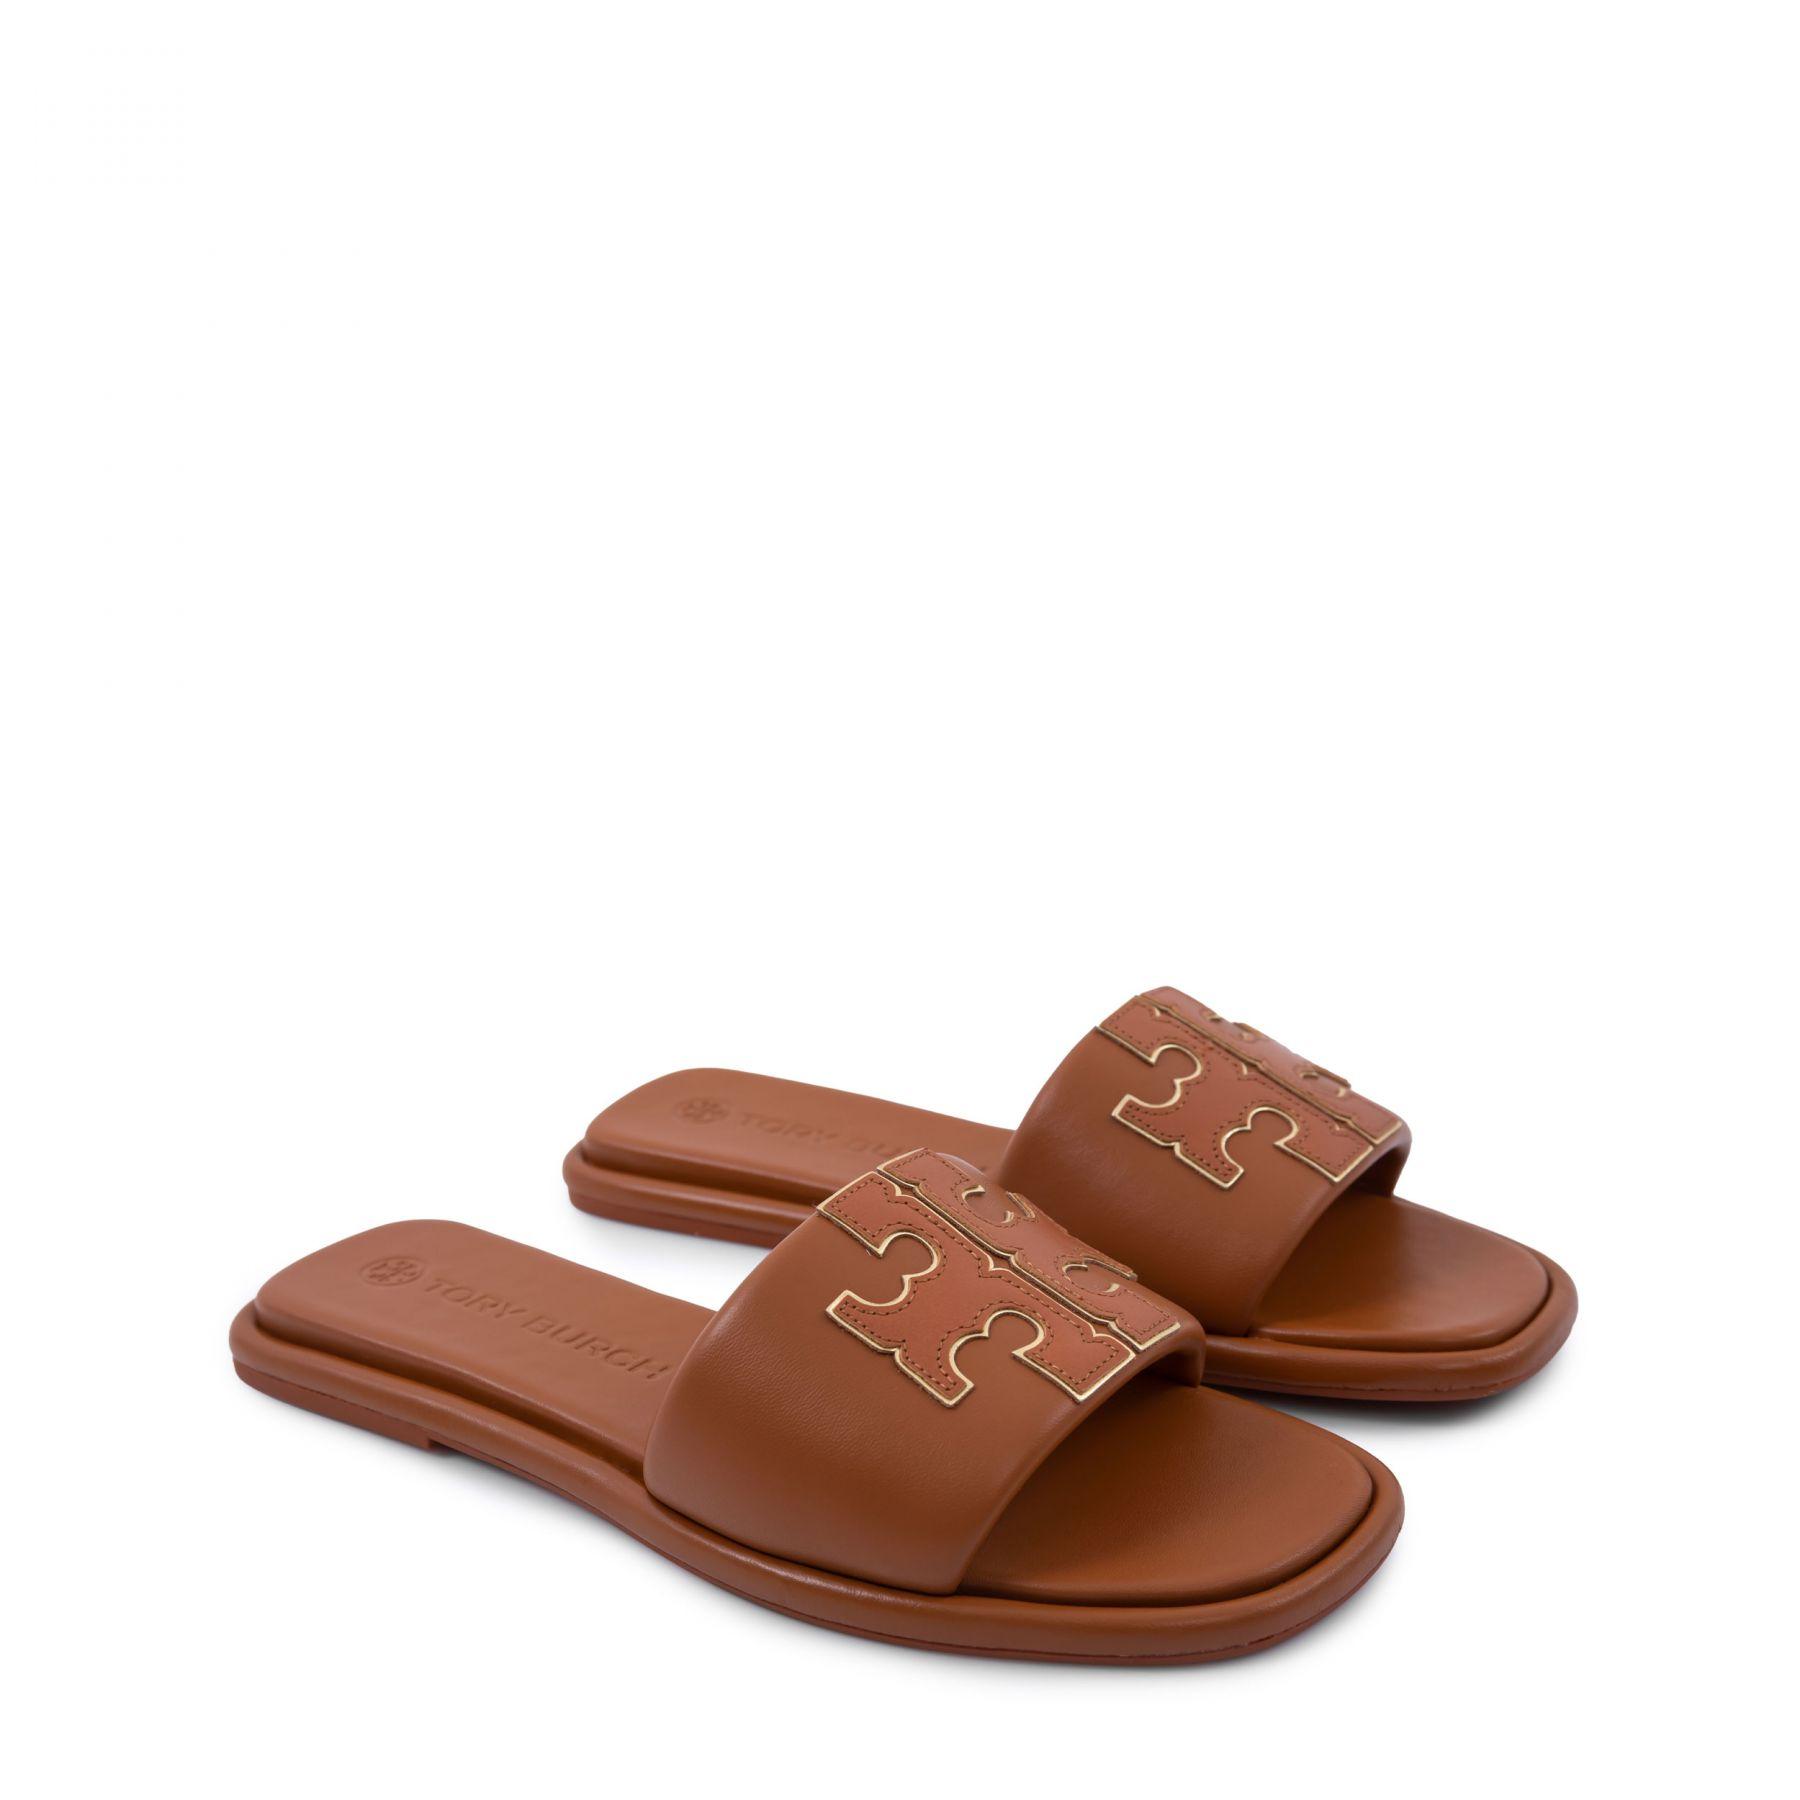 Сабо Tory Burch Ines Slide коричневые